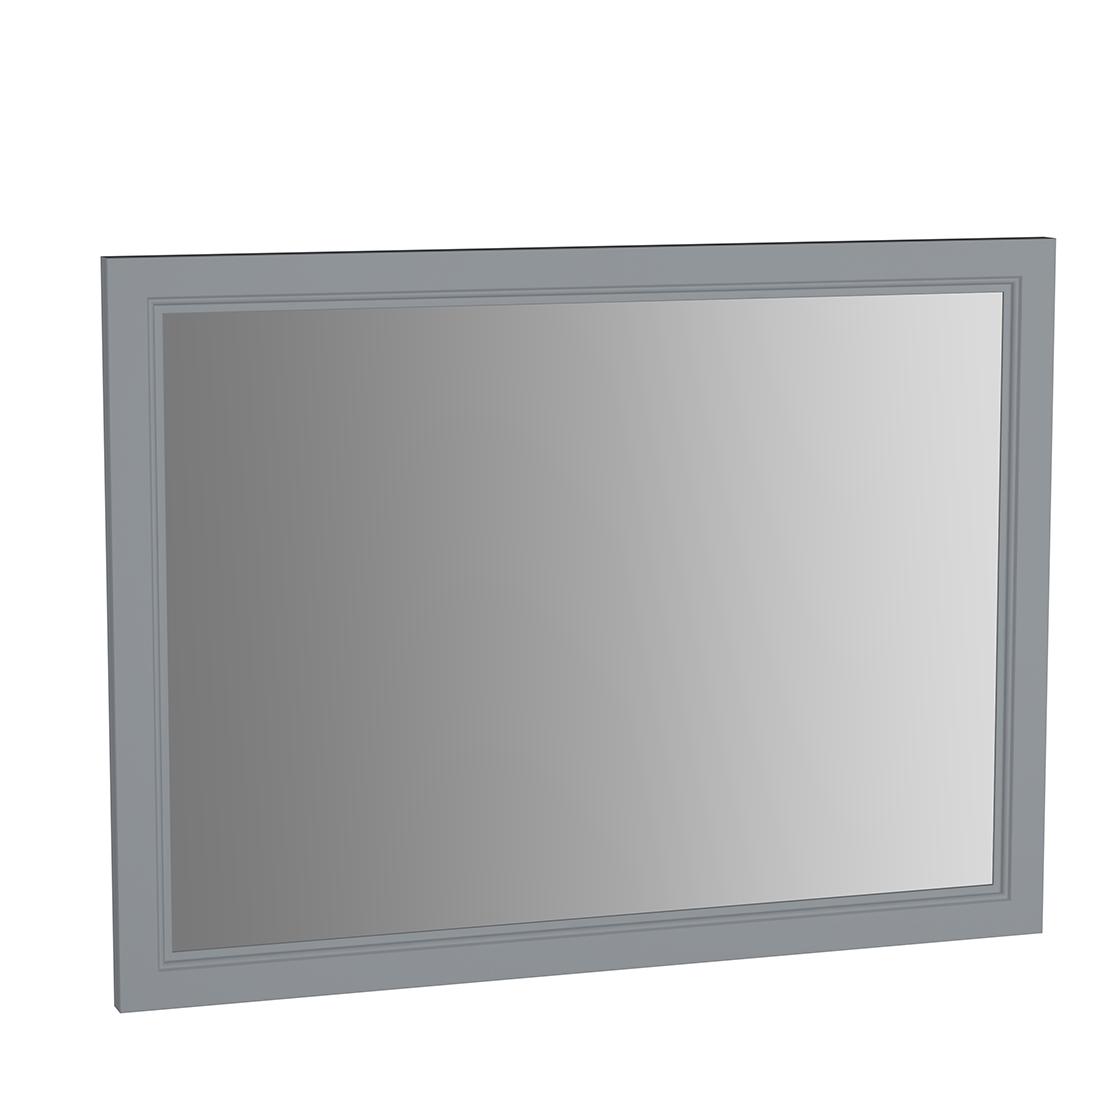 Valarte miroir, 100 cm, gris mat